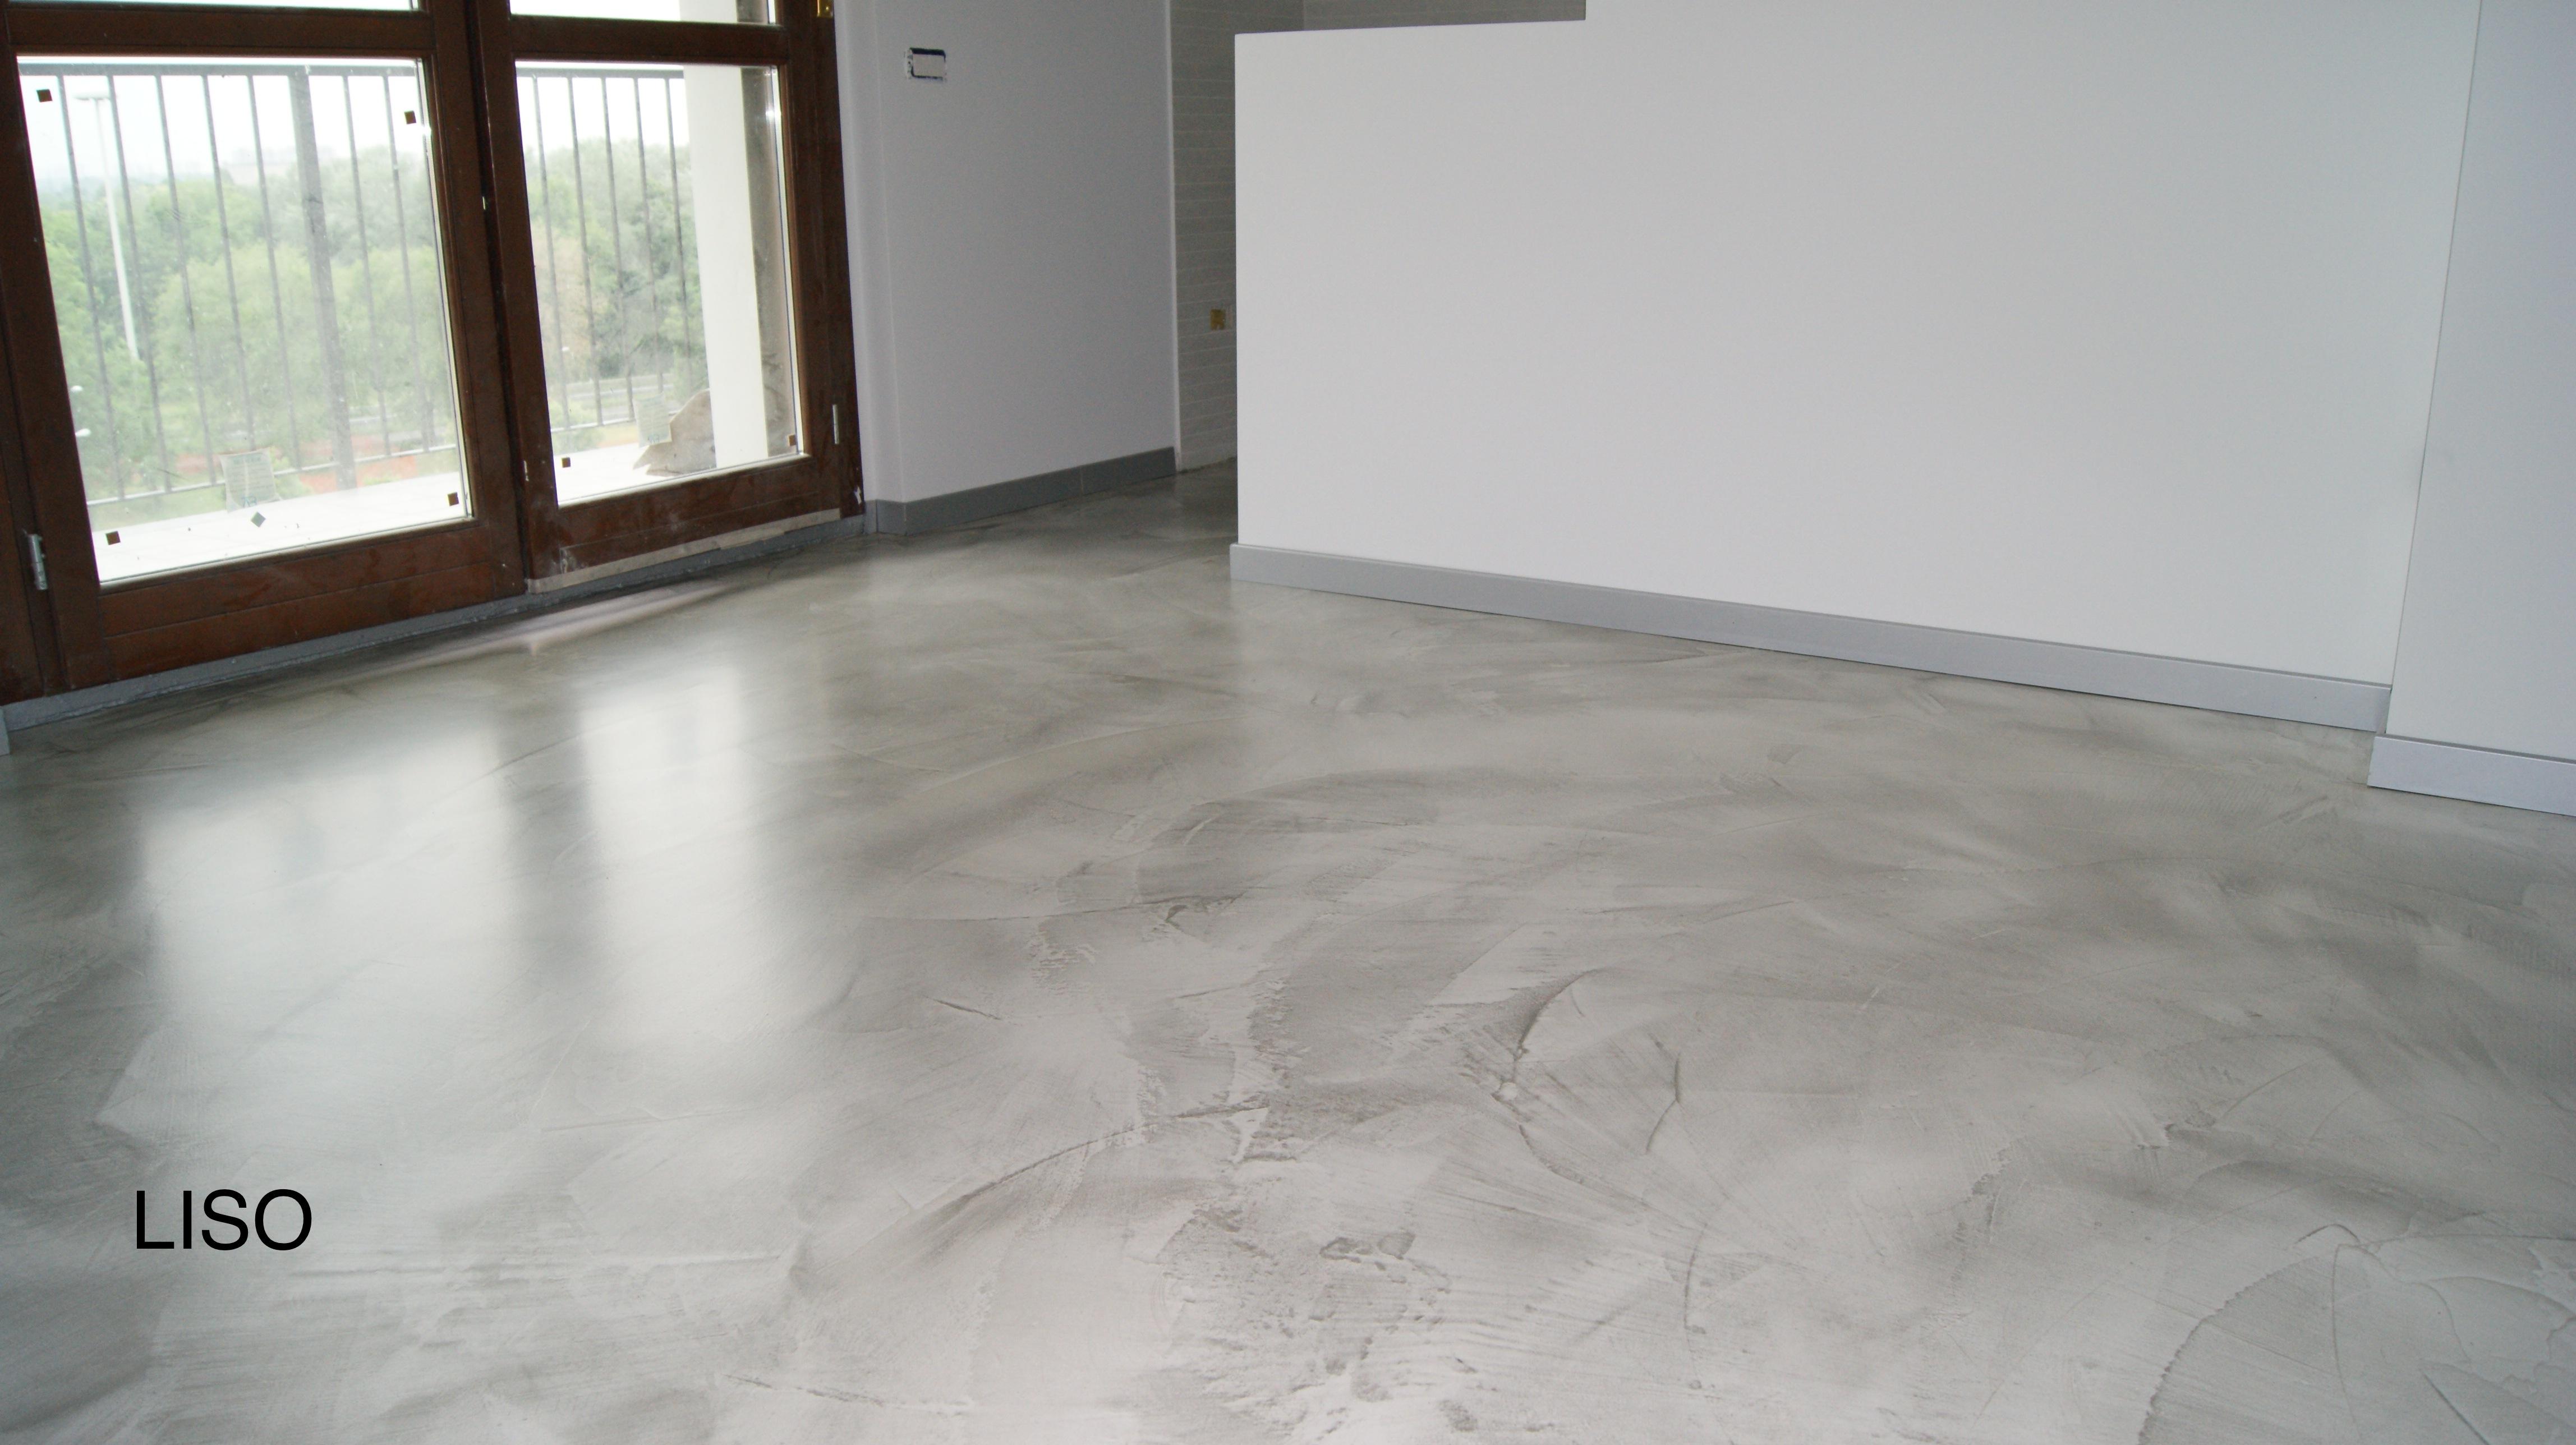 Pavimento In Cemento Prezzi bagno in microcemento resina pavimento rivestimento